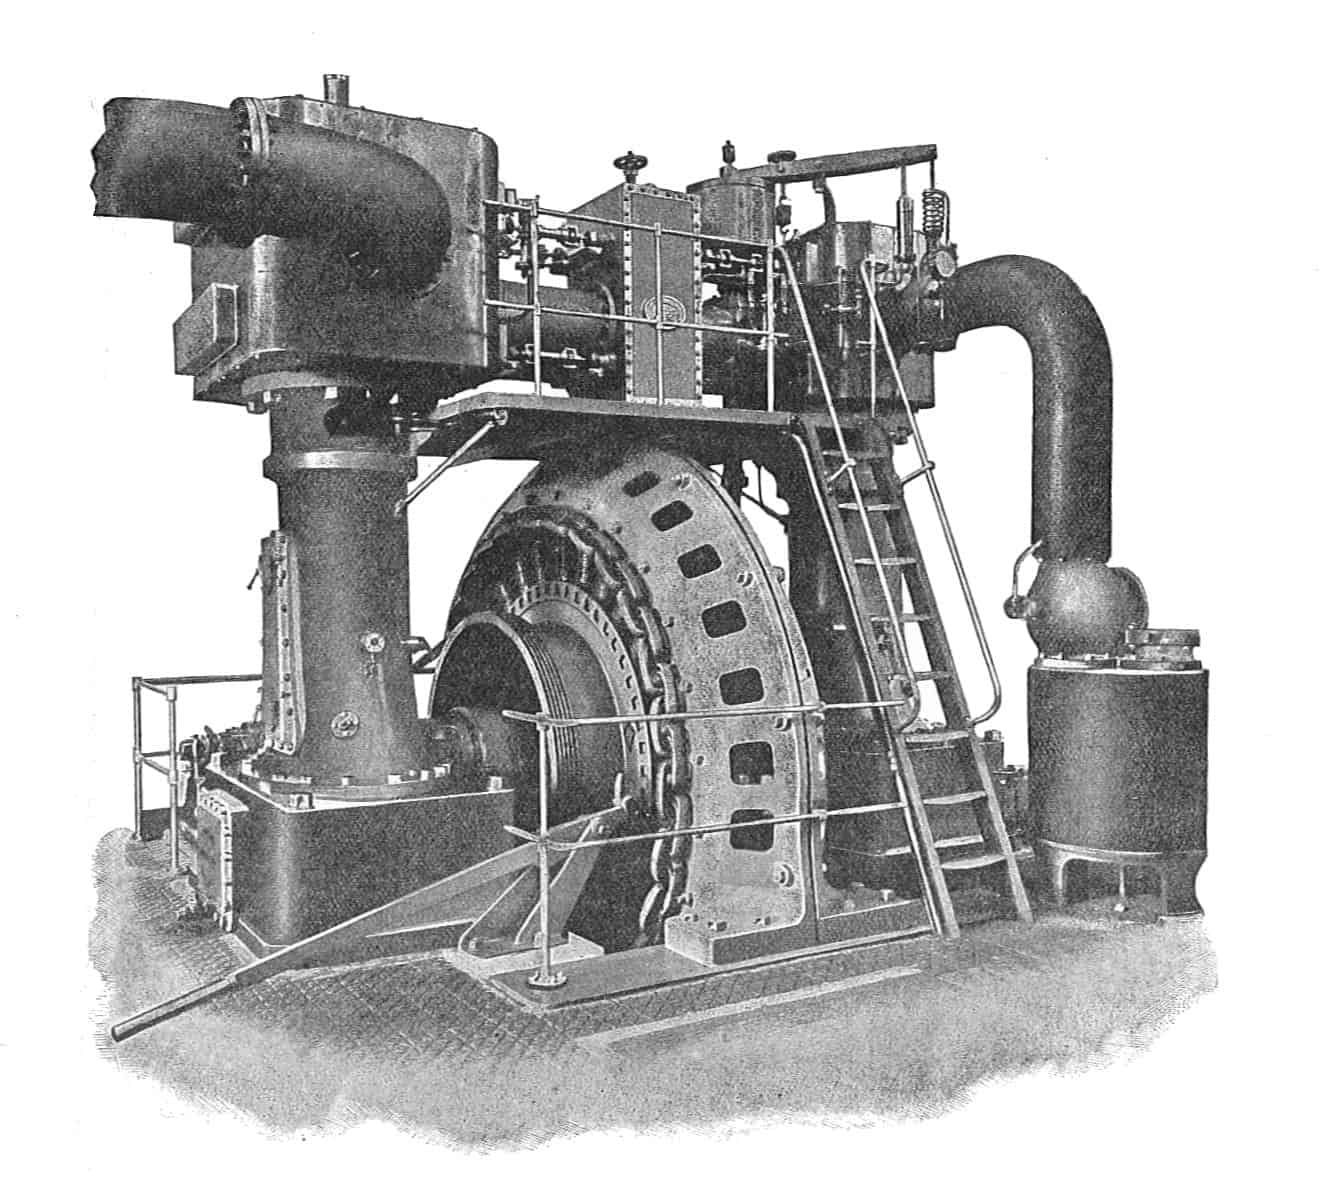 Ferranti's generators were installed at he Deptford Power Station